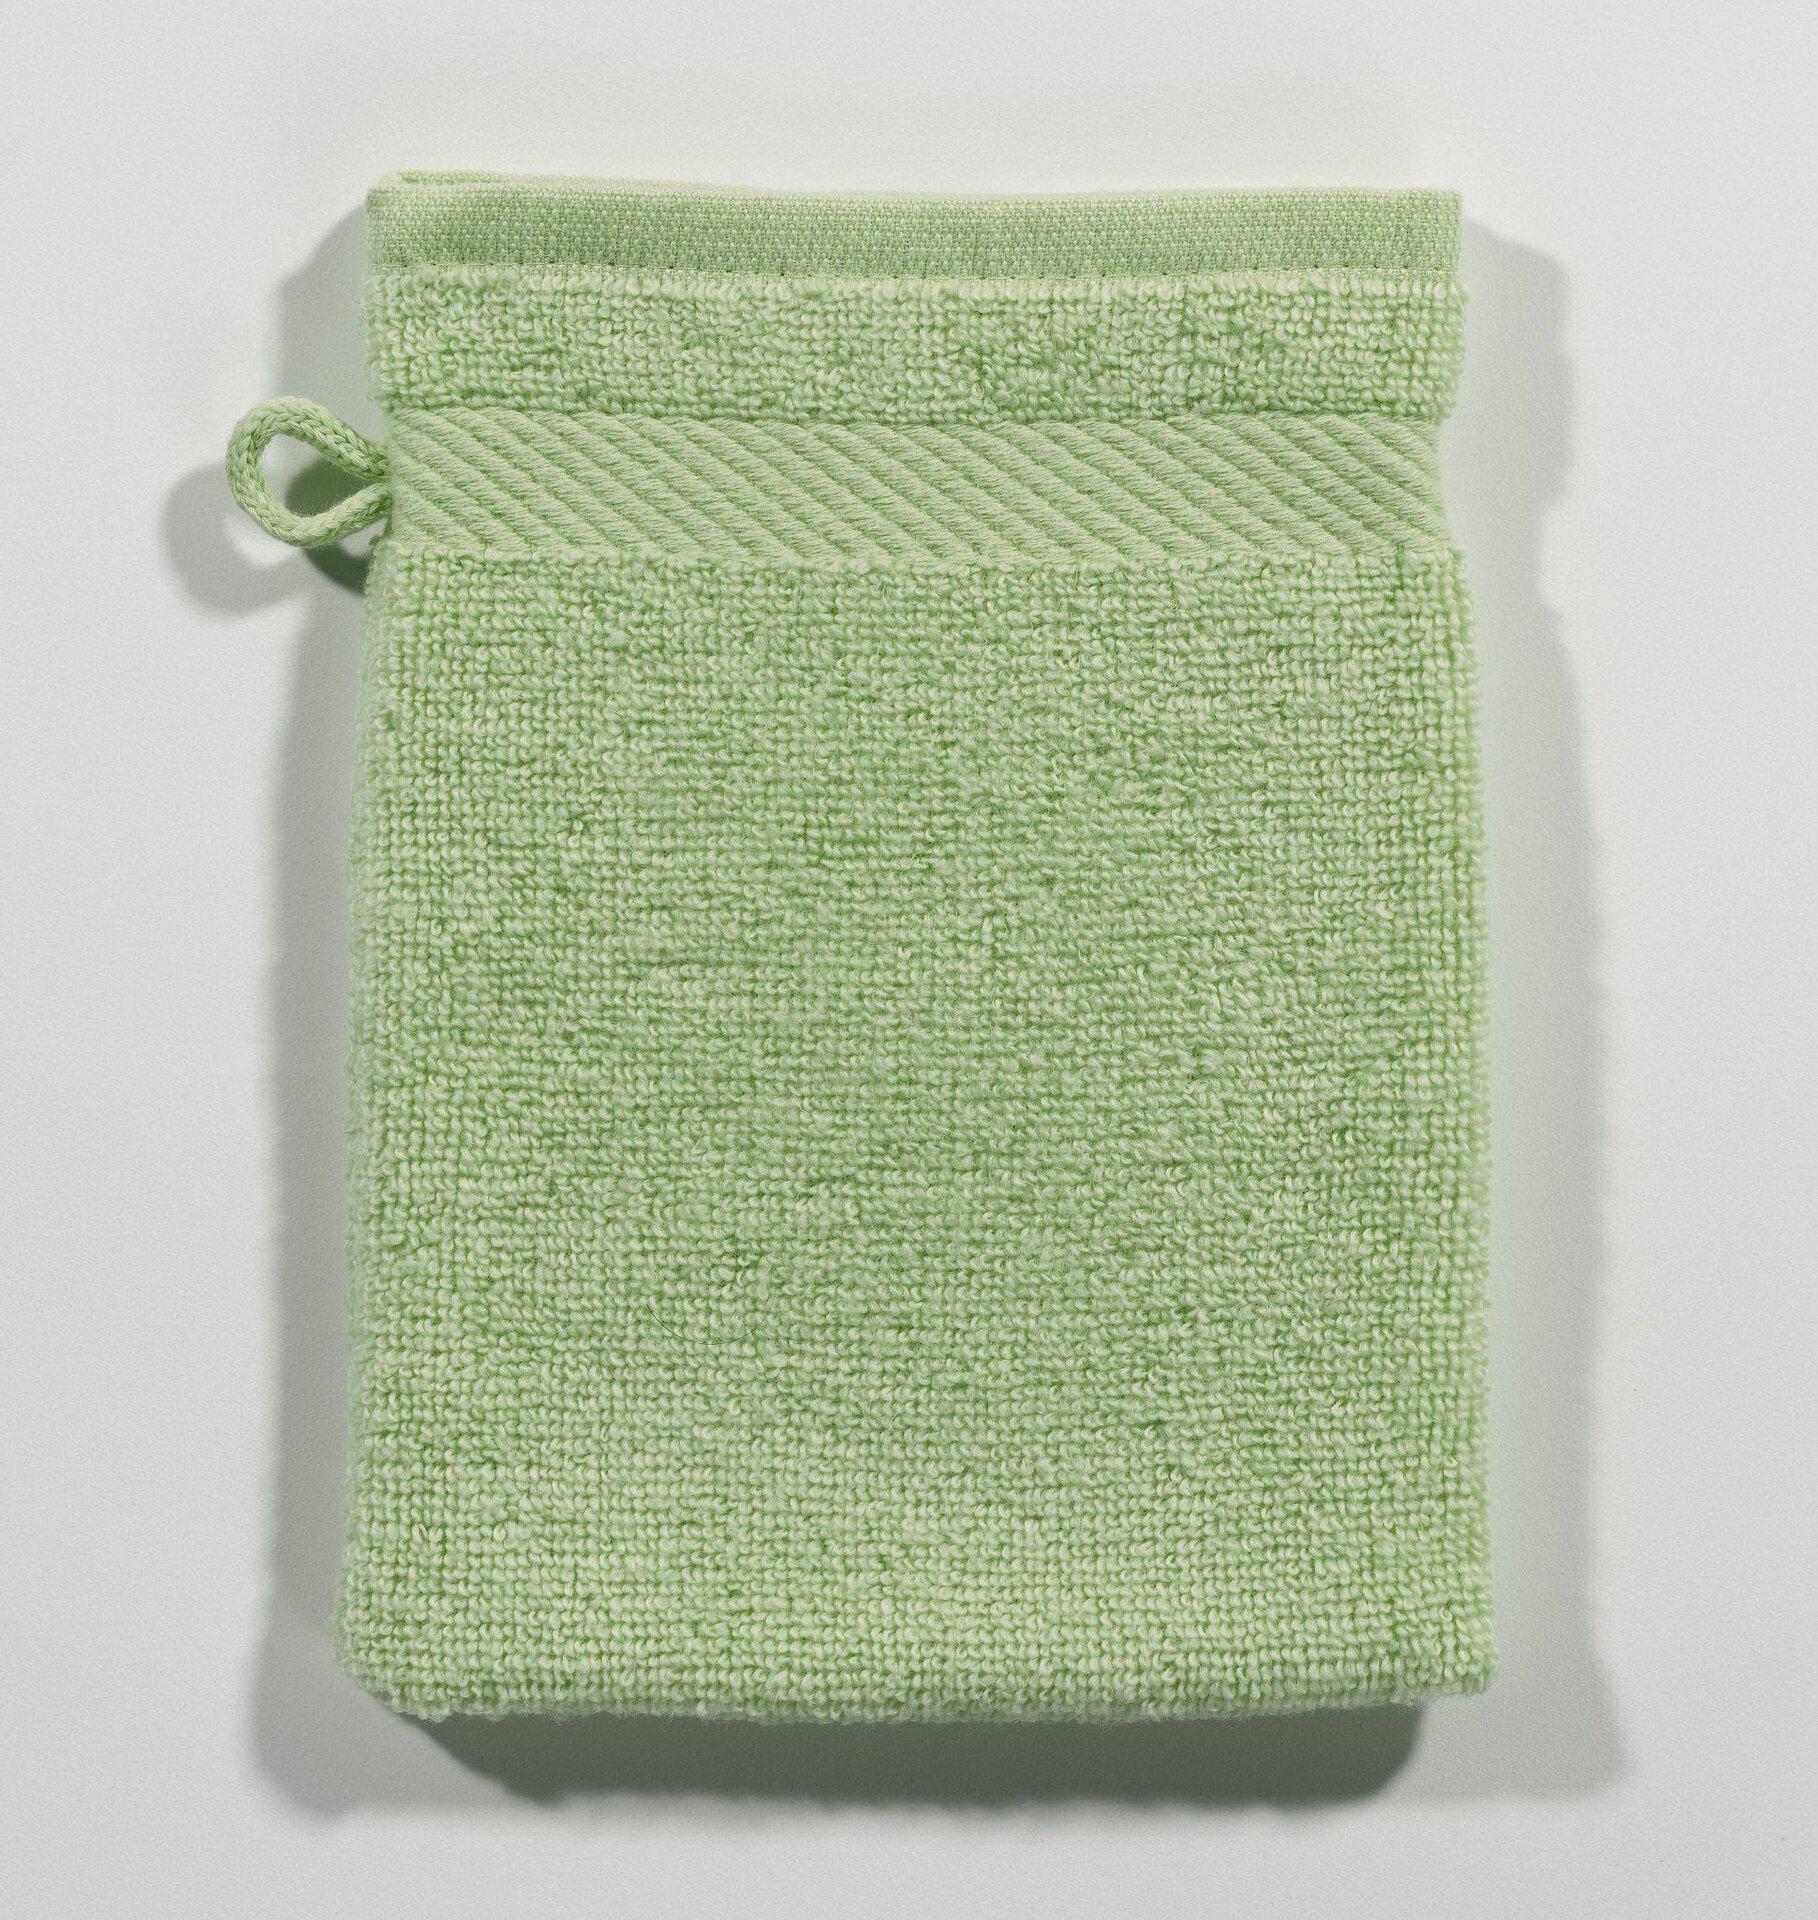 Waschhandschuh Micro Baumwolle Casa Nova Textil 16 x 21 cm